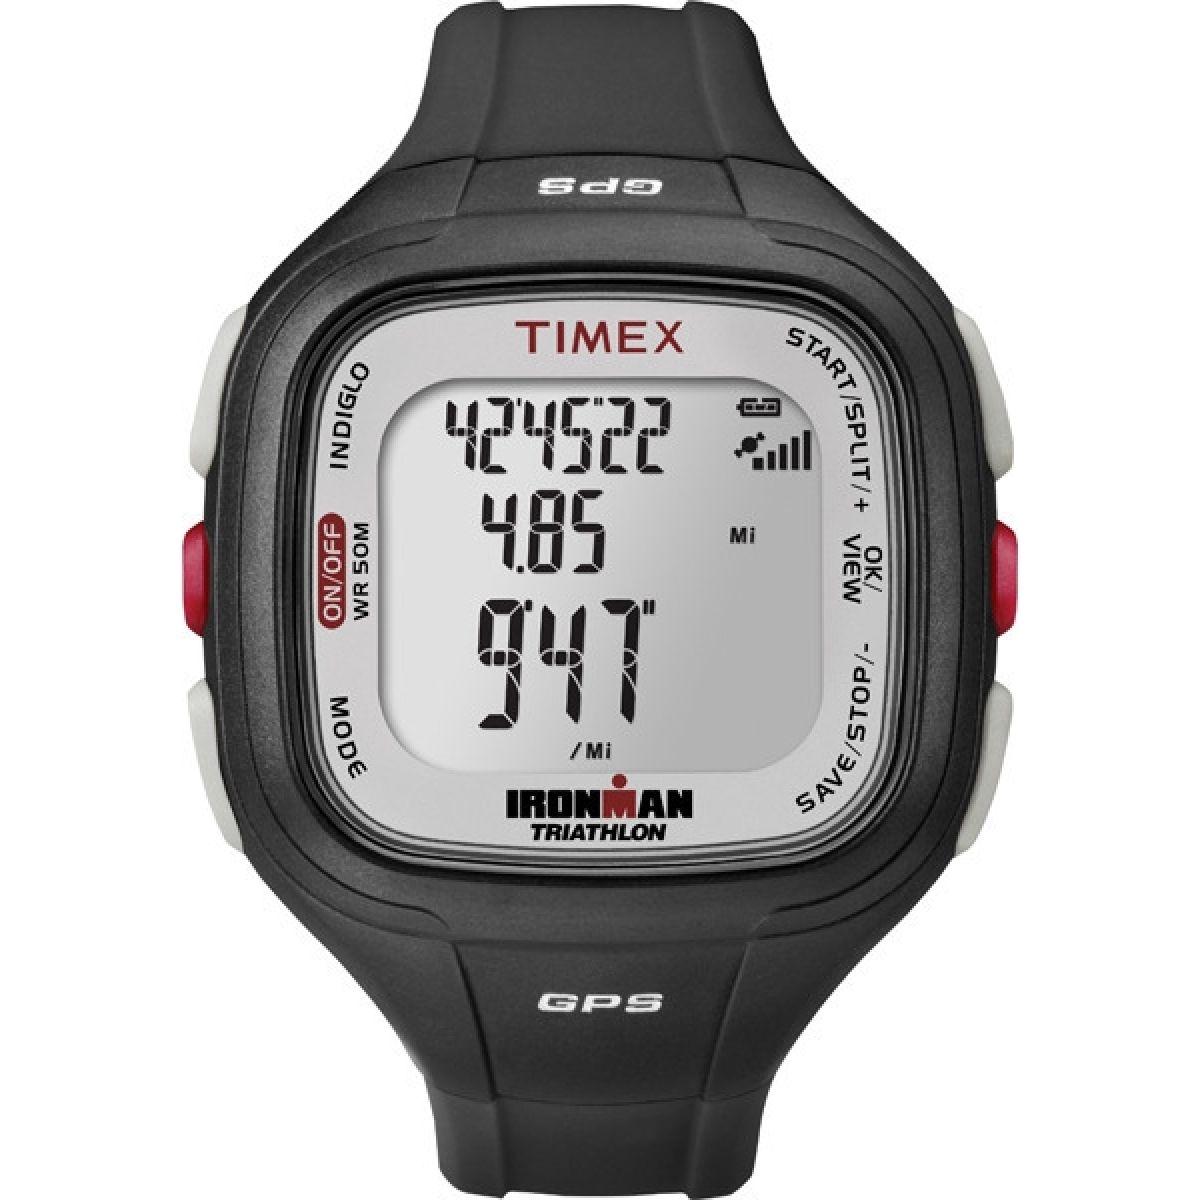 gents timex ironman easy trainer gps alarm chronograph watch t5k754 rh watchshop com timex ironman triathlon user manual download timex ironman gps manual